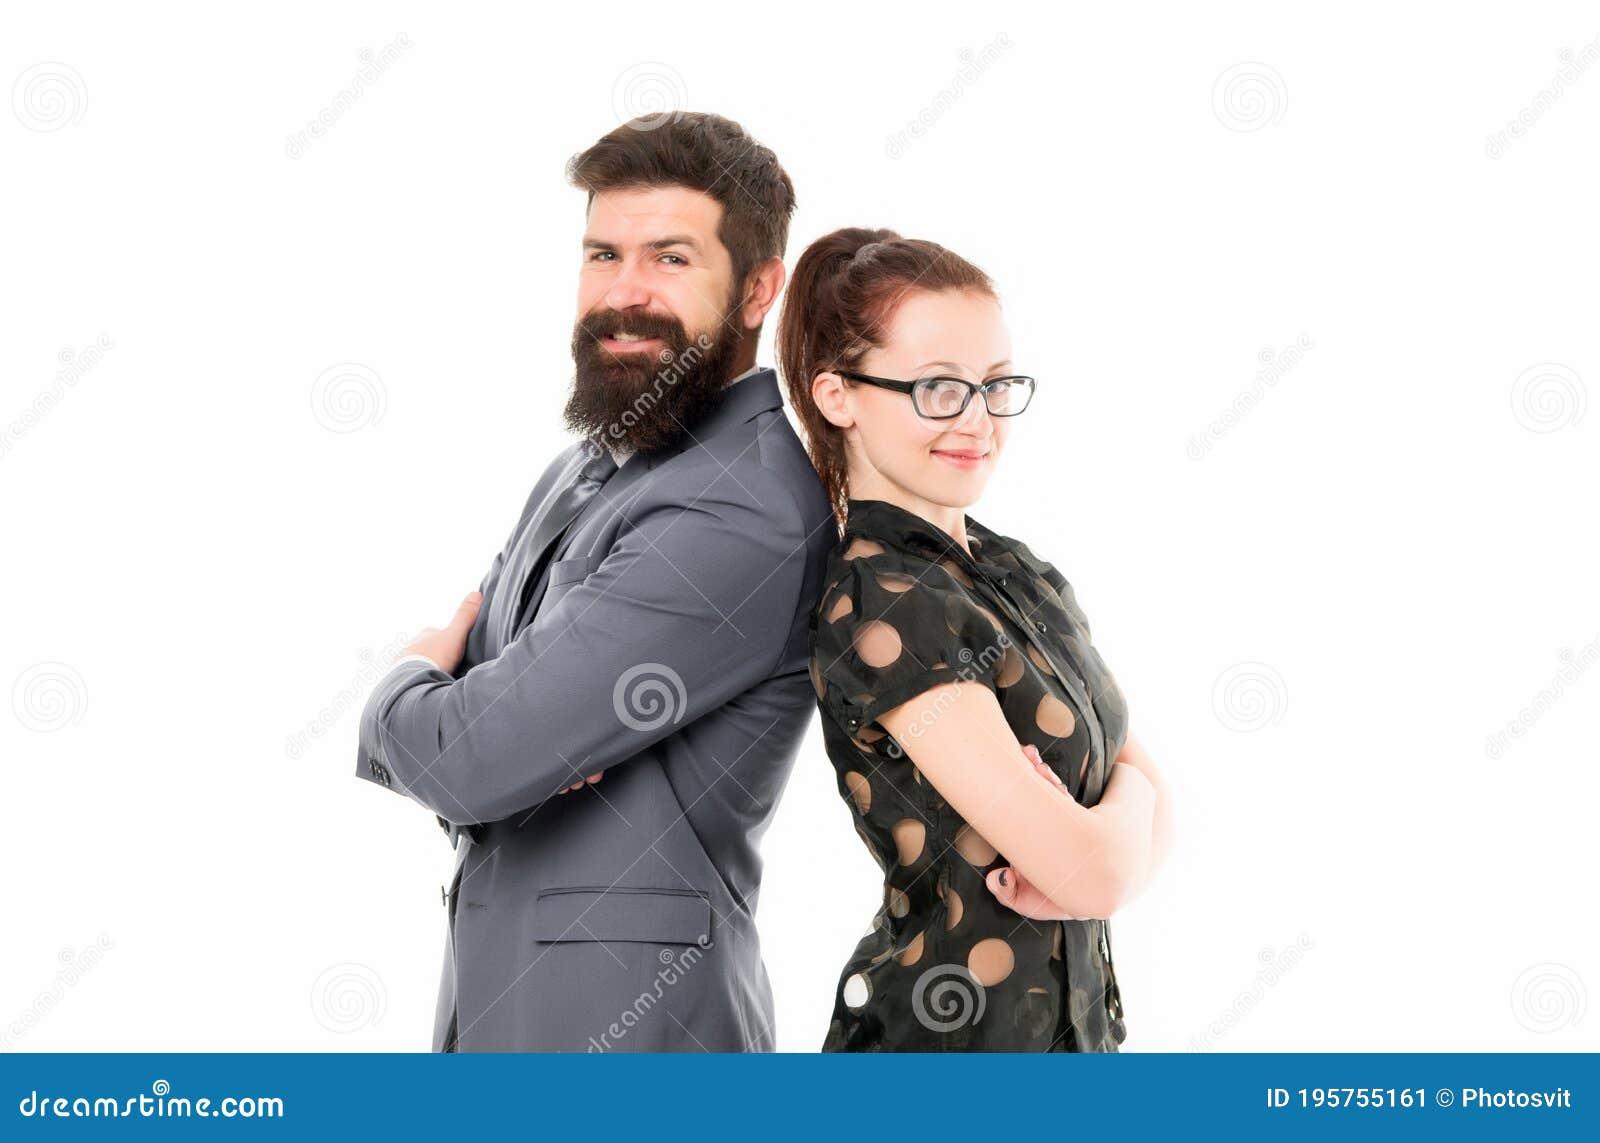 dating craftsman manager